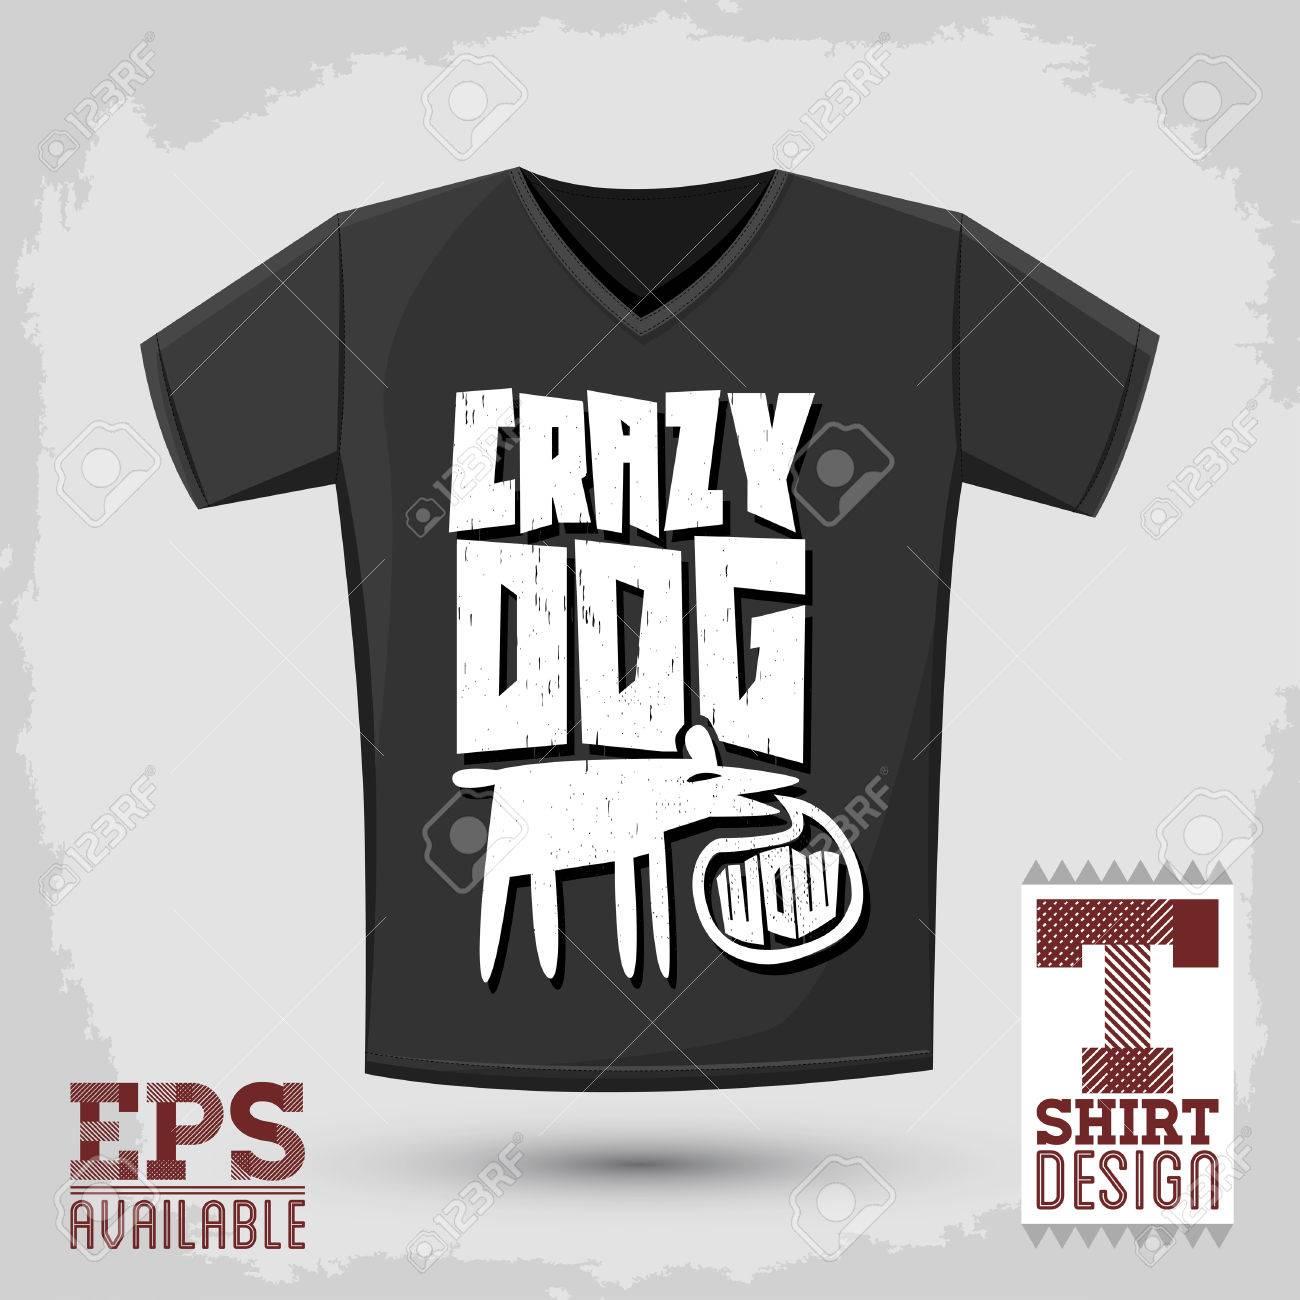 Graphic Tshirt Design Crazy Dog Vector Typographic Design Royalty